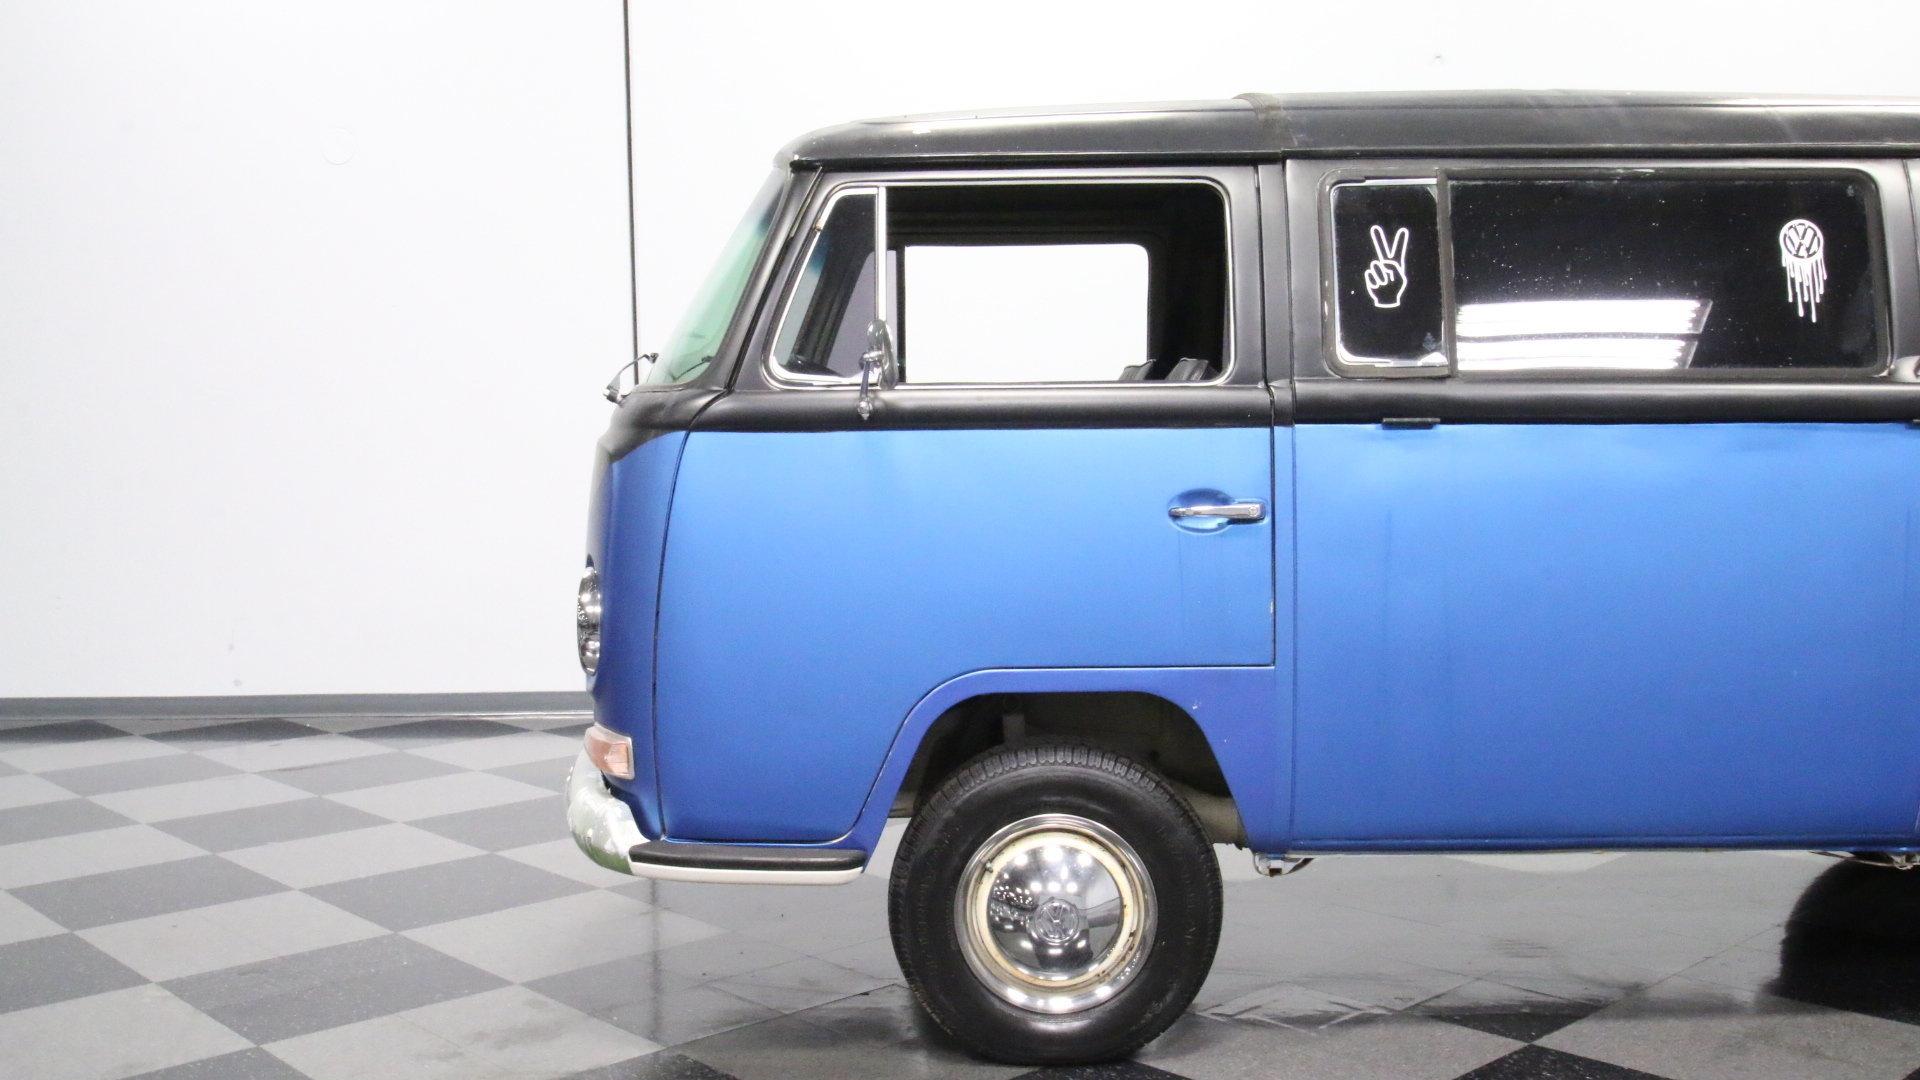 1970 Volkswagen Bus Bar Conversion for sale #109608 | MCG